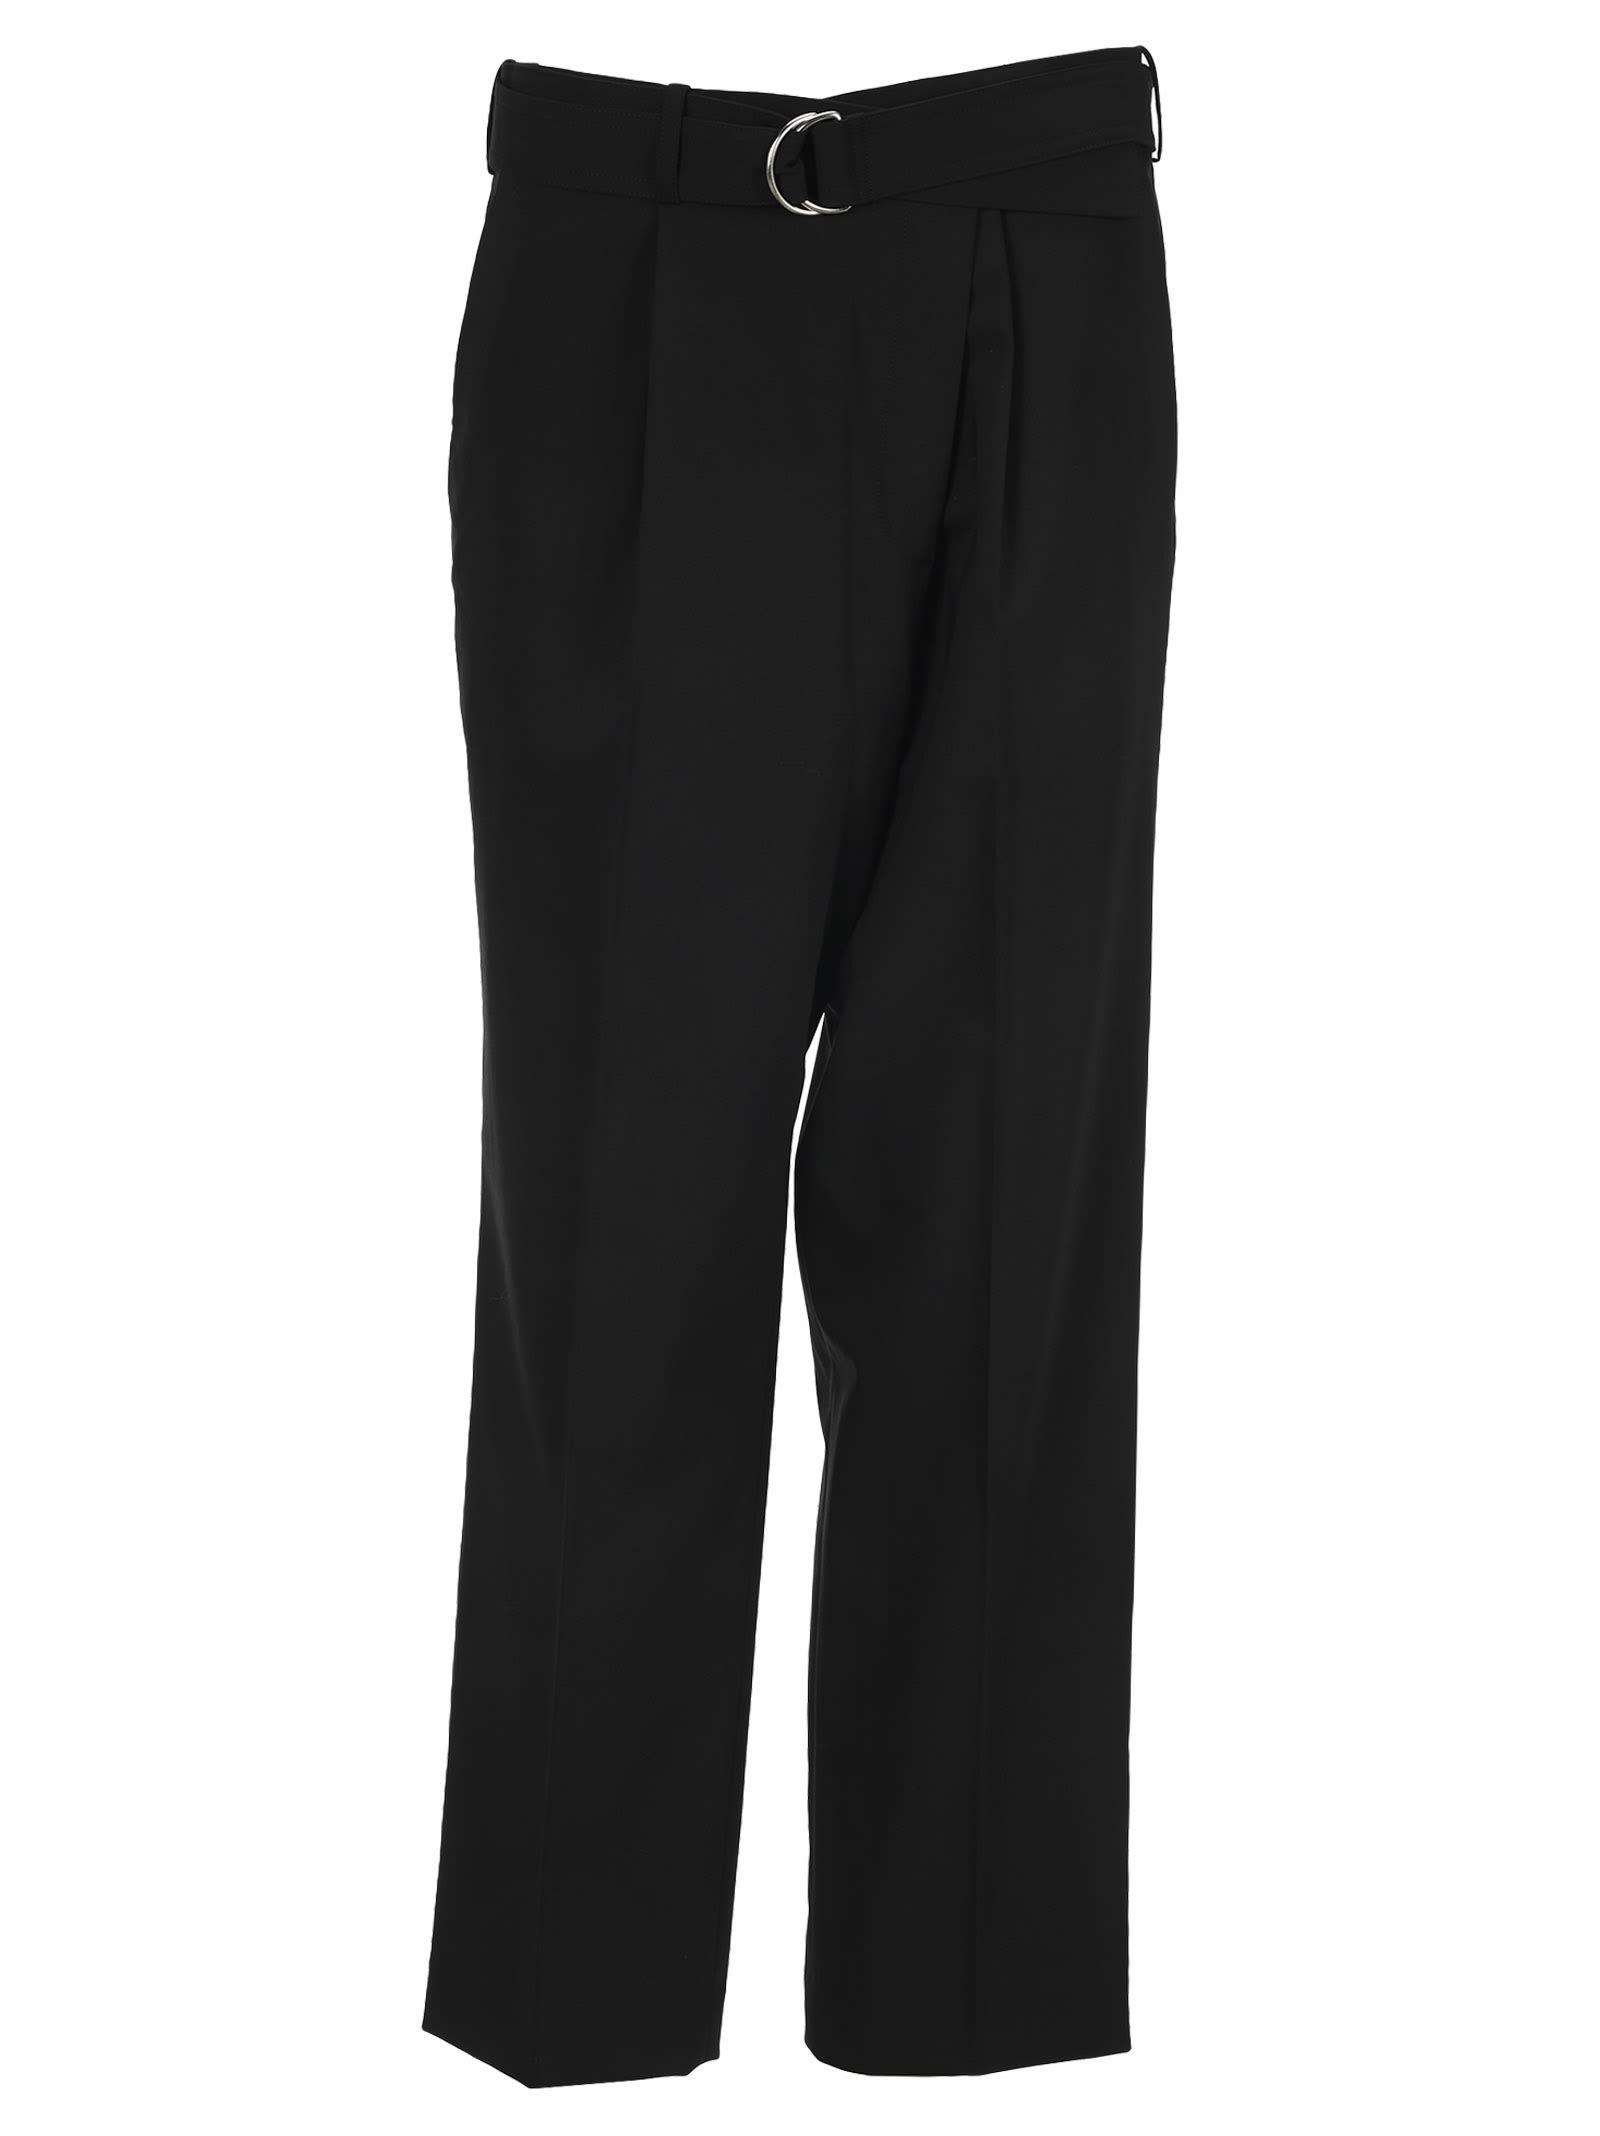 Helmut Lang Pleated Pants